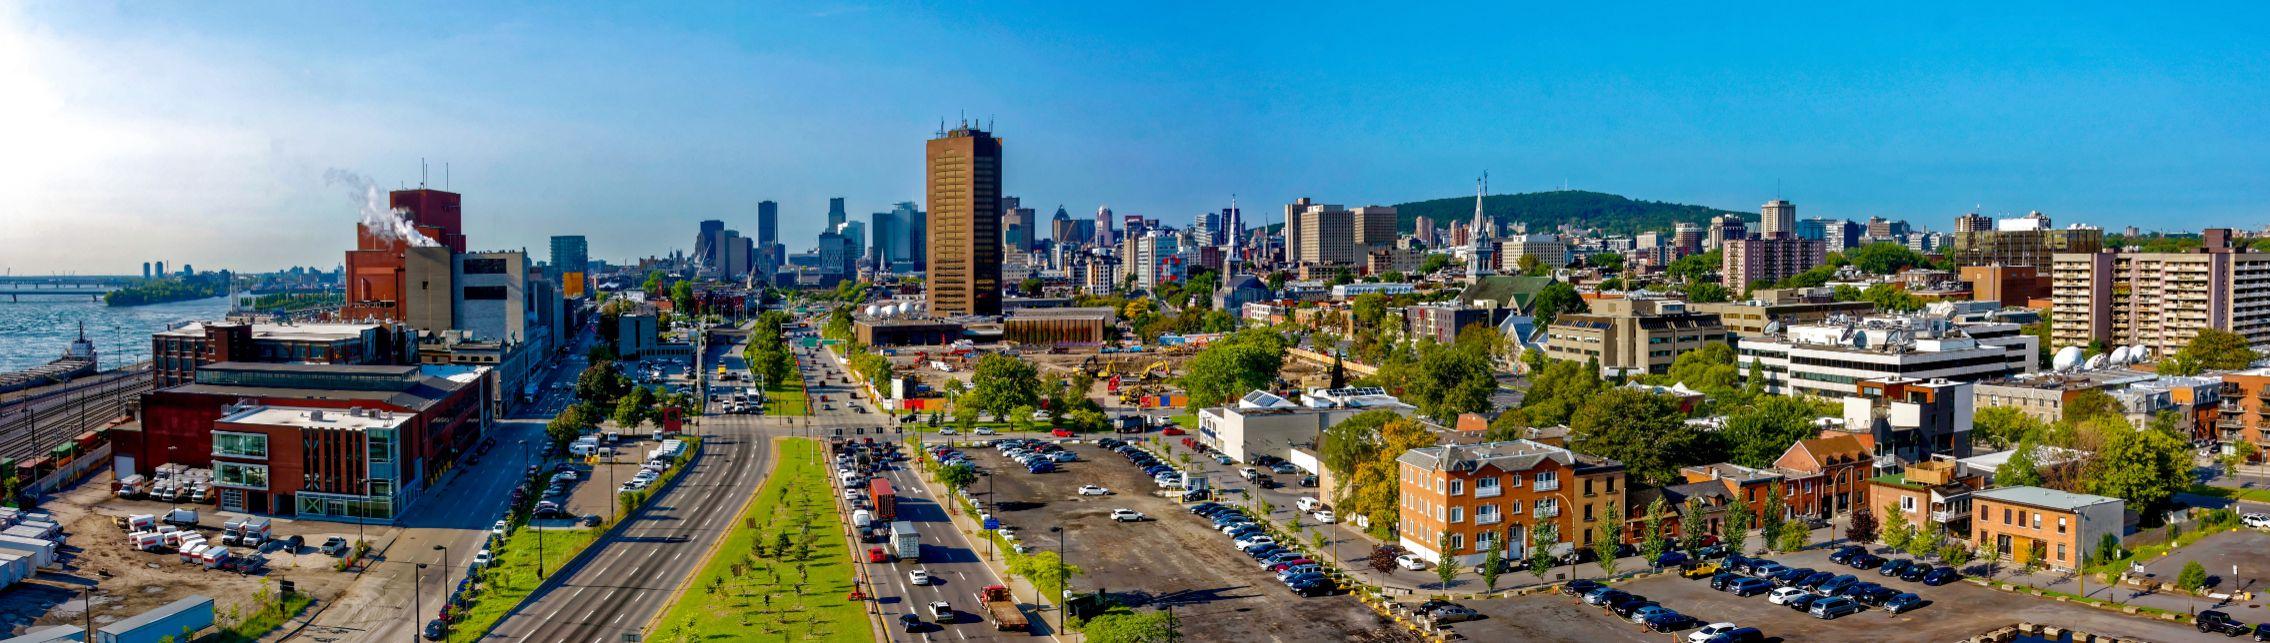 prix maisons a vendre montreal